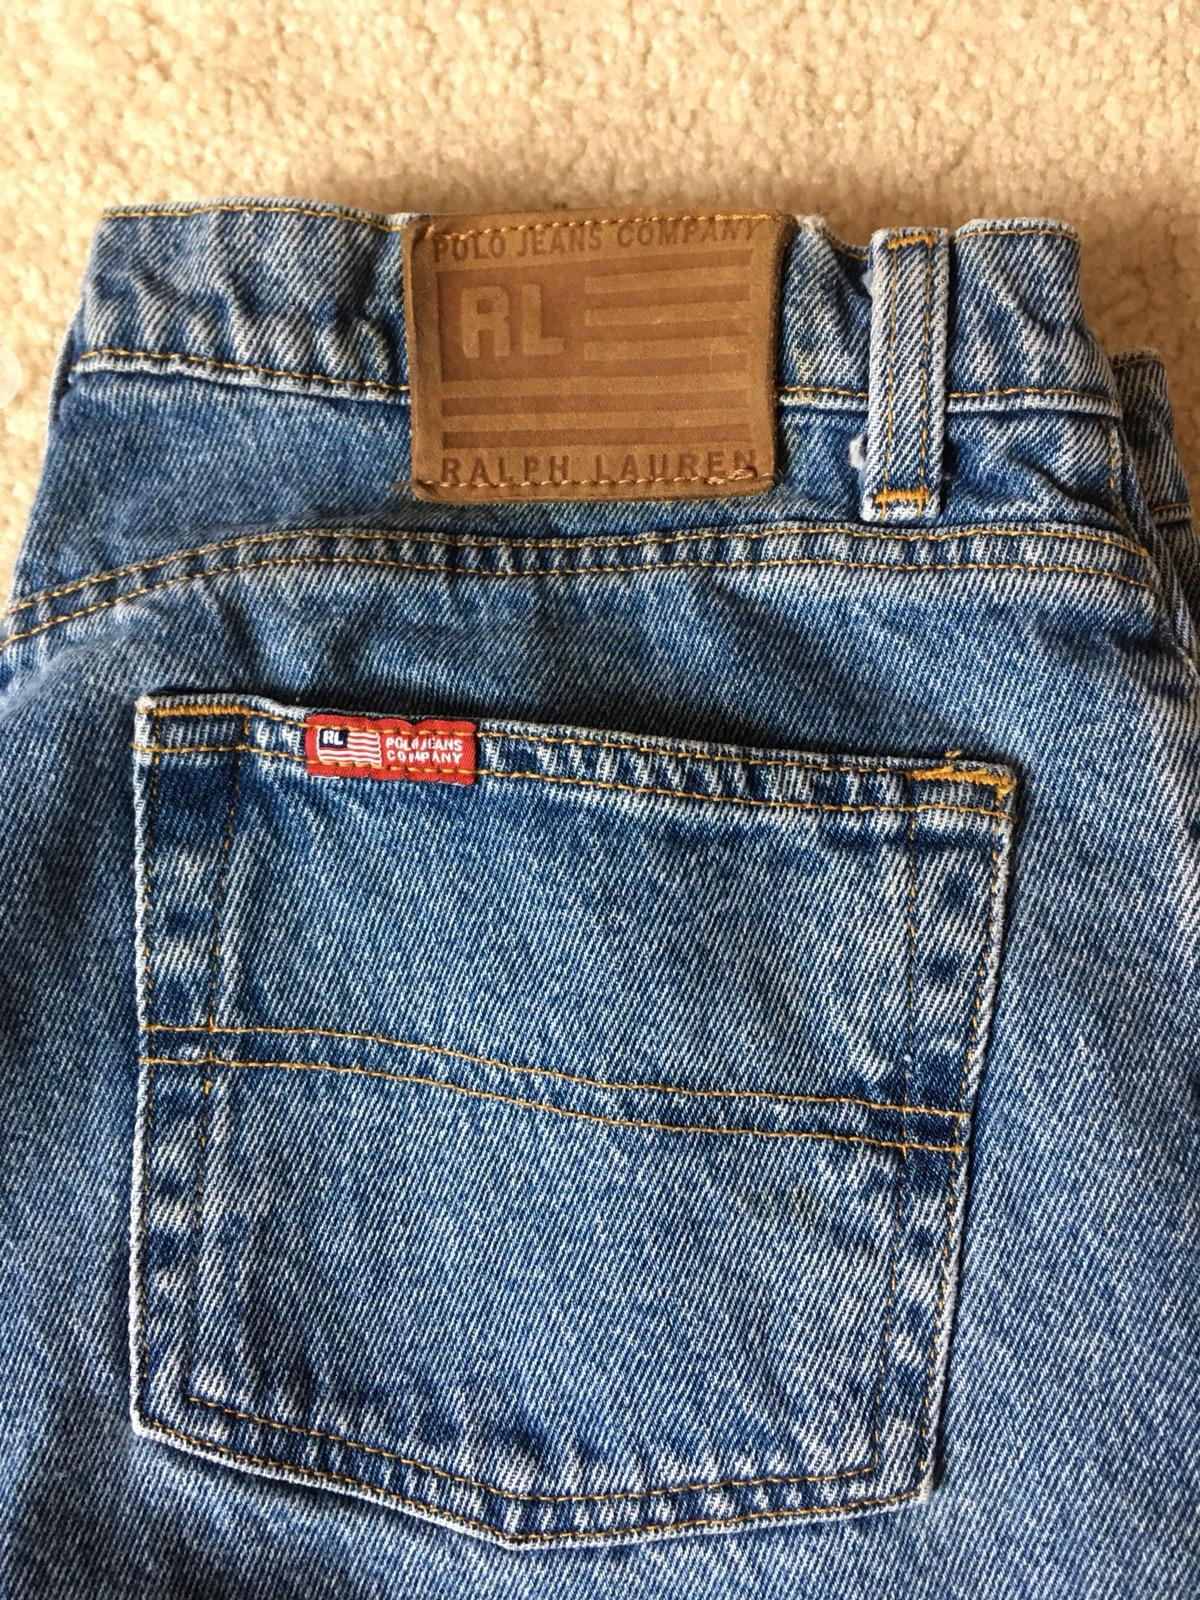 Vintage 90's Ralph Lauren Jeans Denim Polo Sport Polo Jeans Company Tommy Hilfiger Guess Nautica